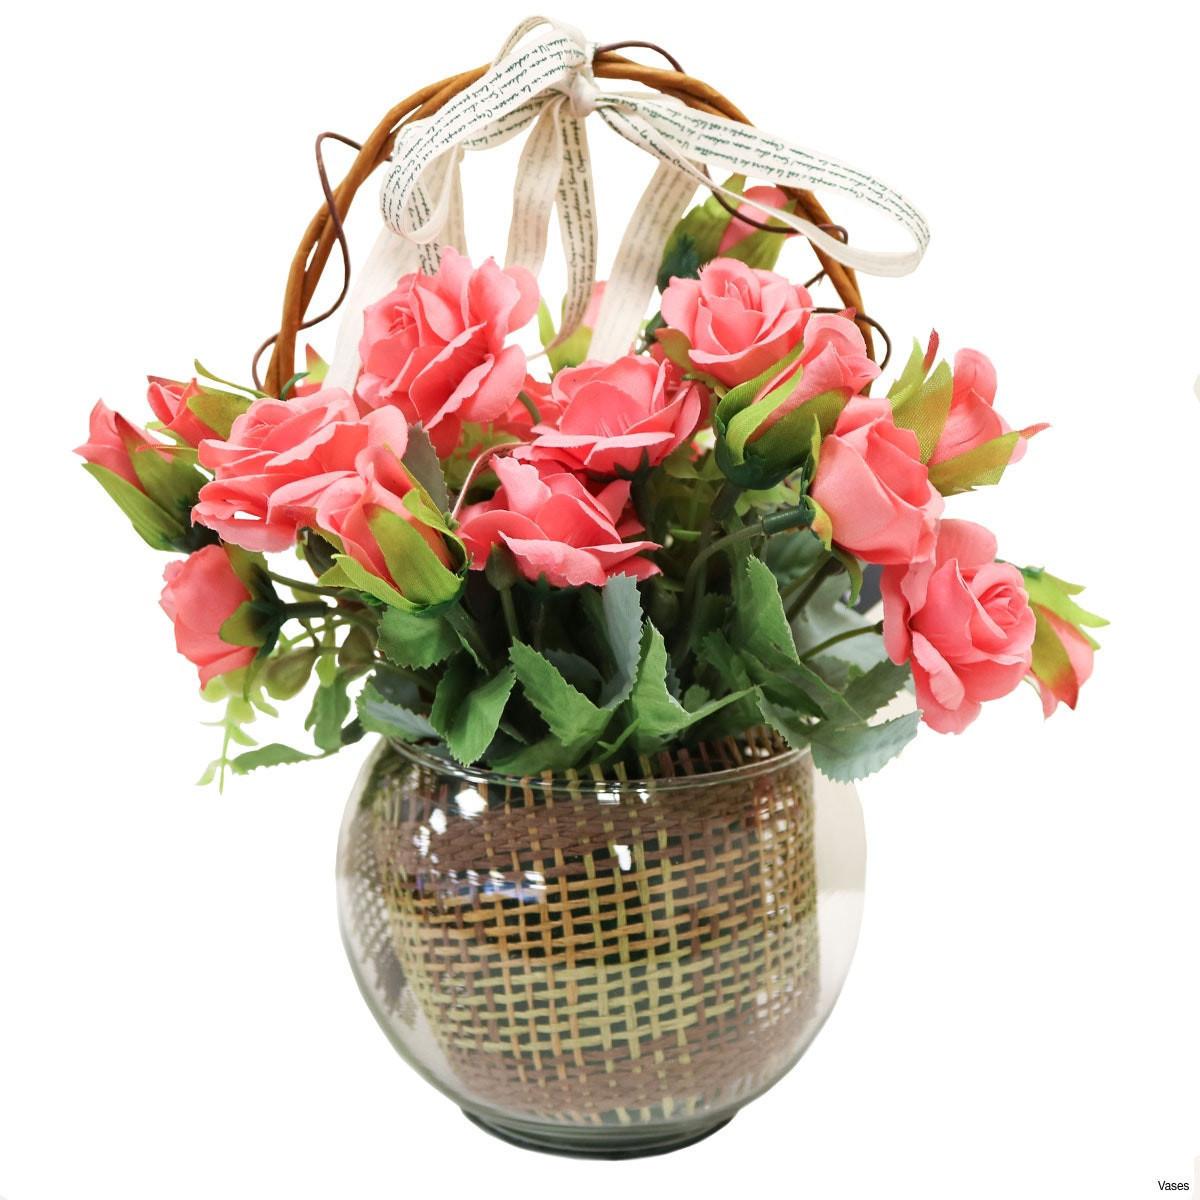 17 Cute French Art Deco Vase 2021 free download french art deco vase of mini glass vase pics bf142 11km 1200x1200h vases pink flower vase i with mini glass vase pics bf142 11km 1200x1200h vases pink flower vase i 0d gold inspiration of